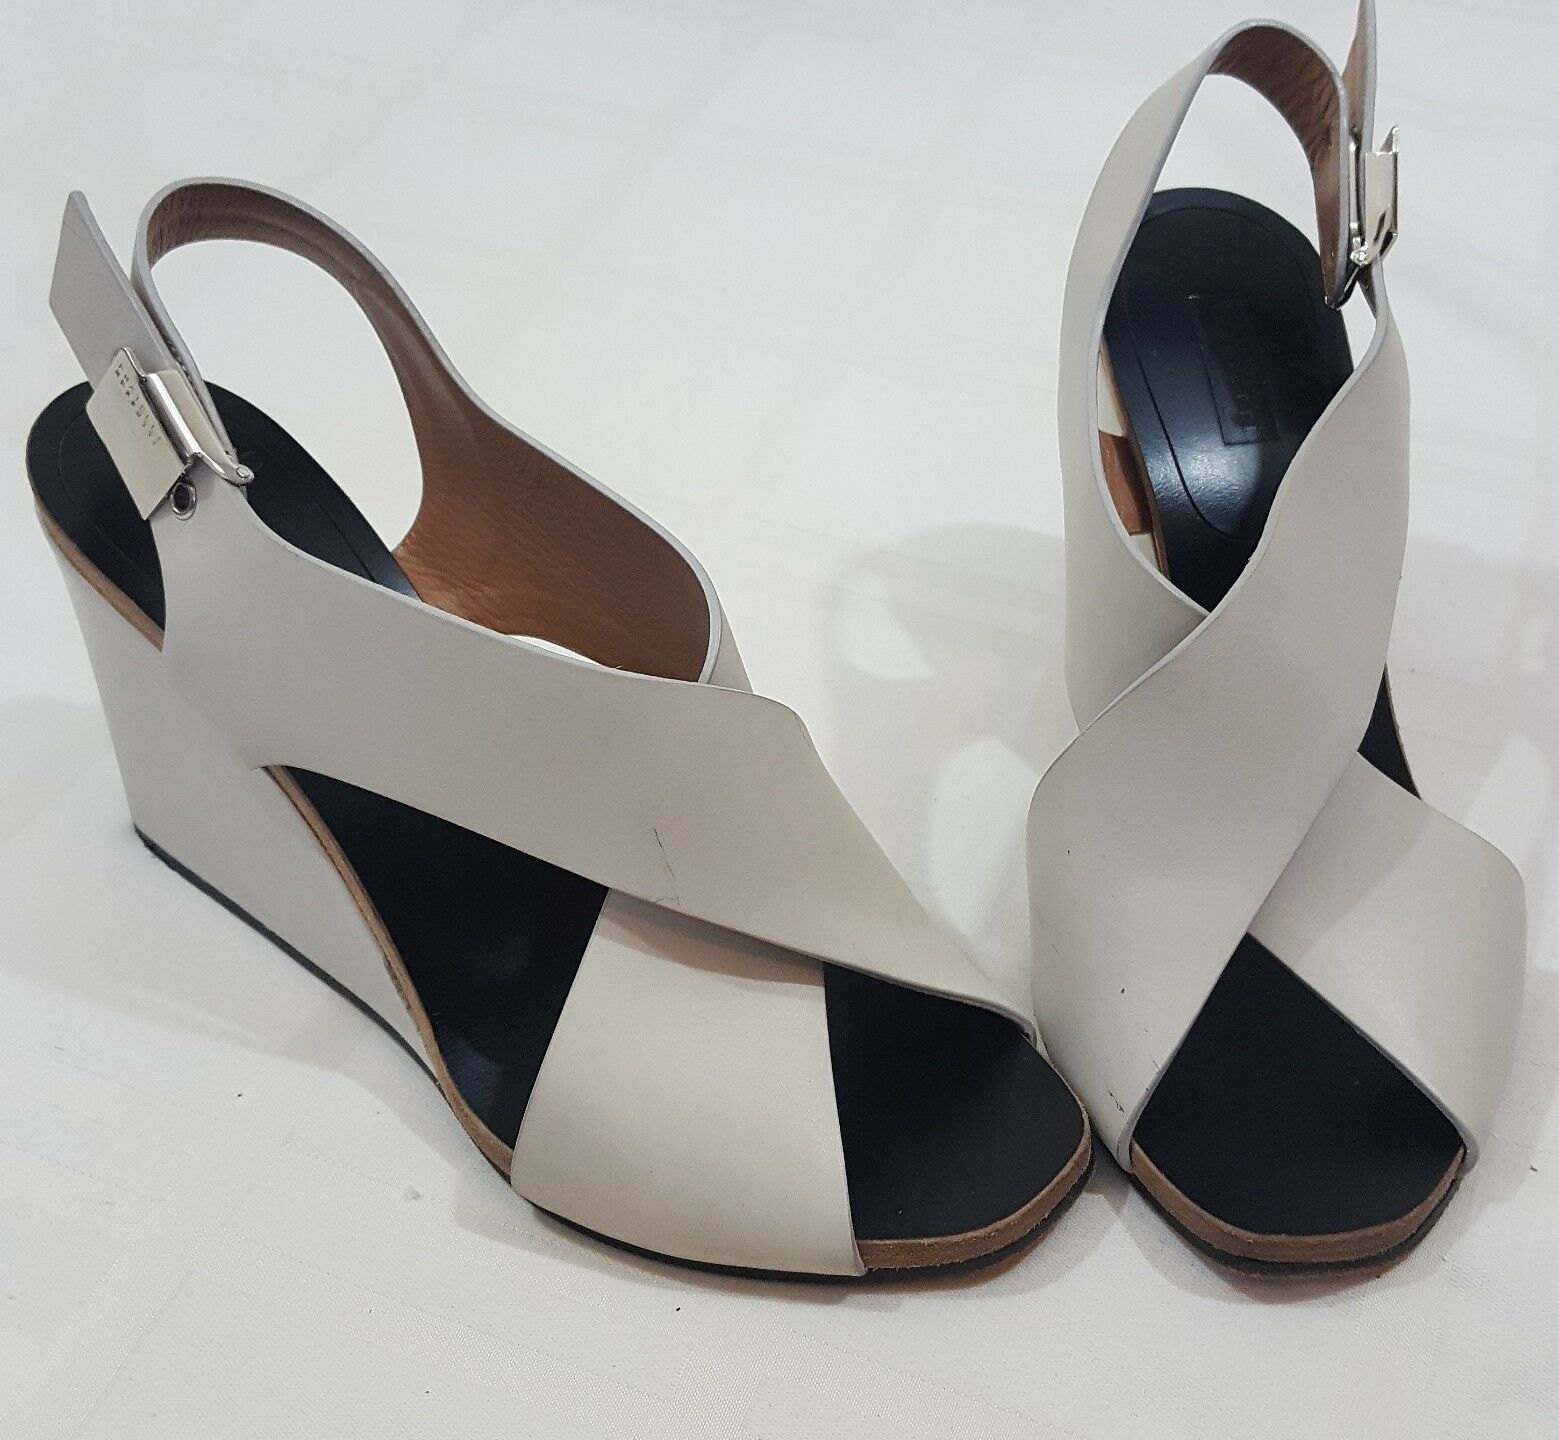 Fratelli pinktti Women's Leather White Beige Wedge Sligback Heel  Size 6